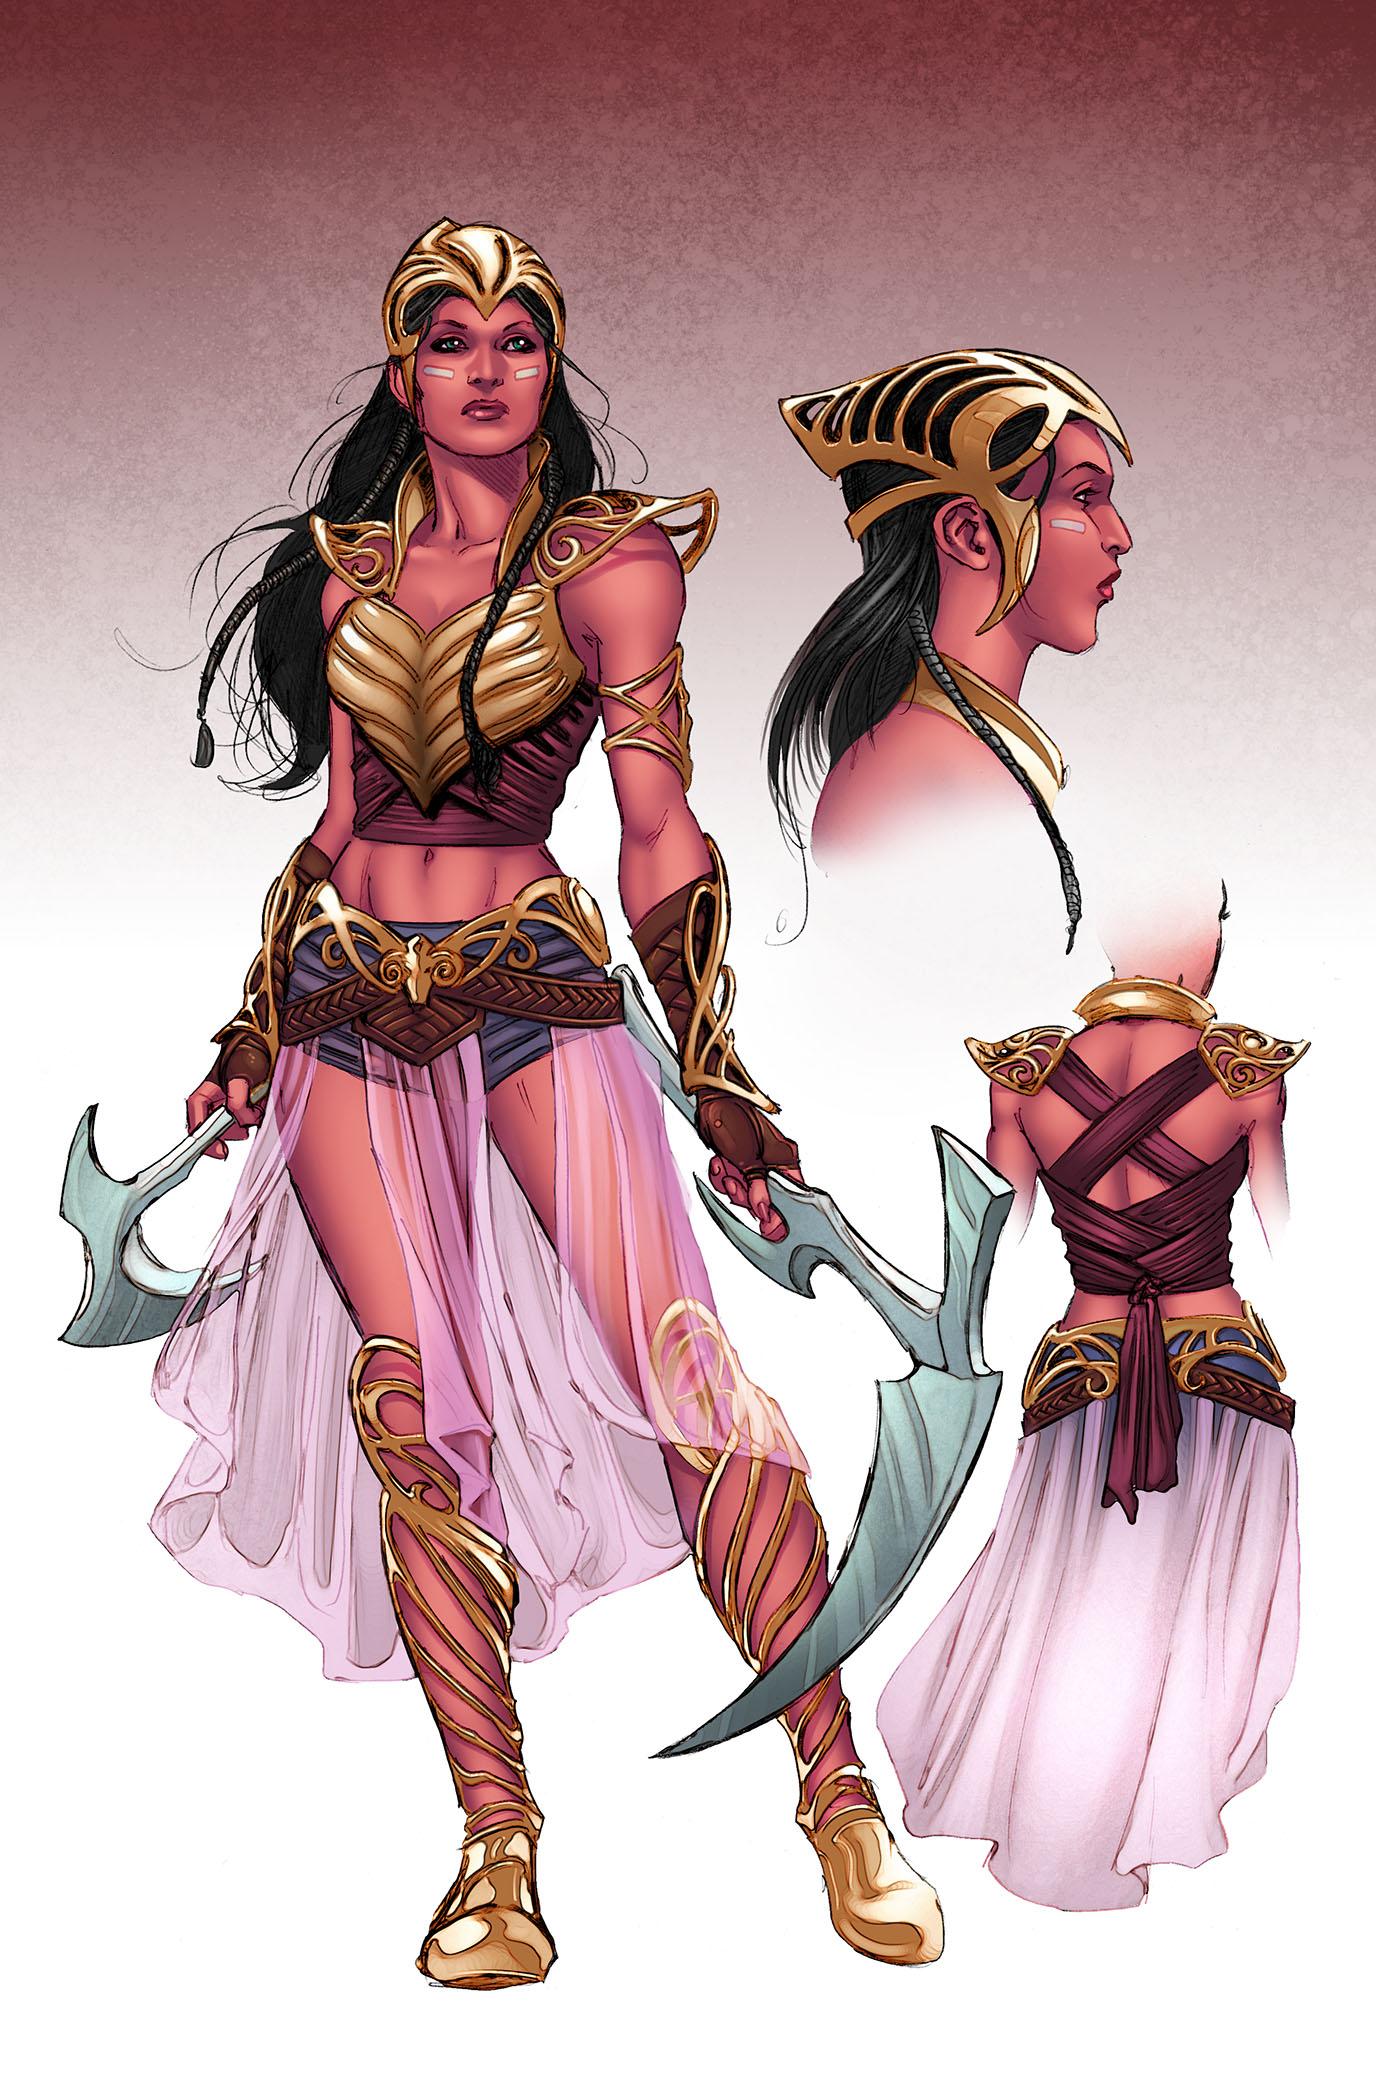 Can Princess of mars dejah thoris cosplay useful